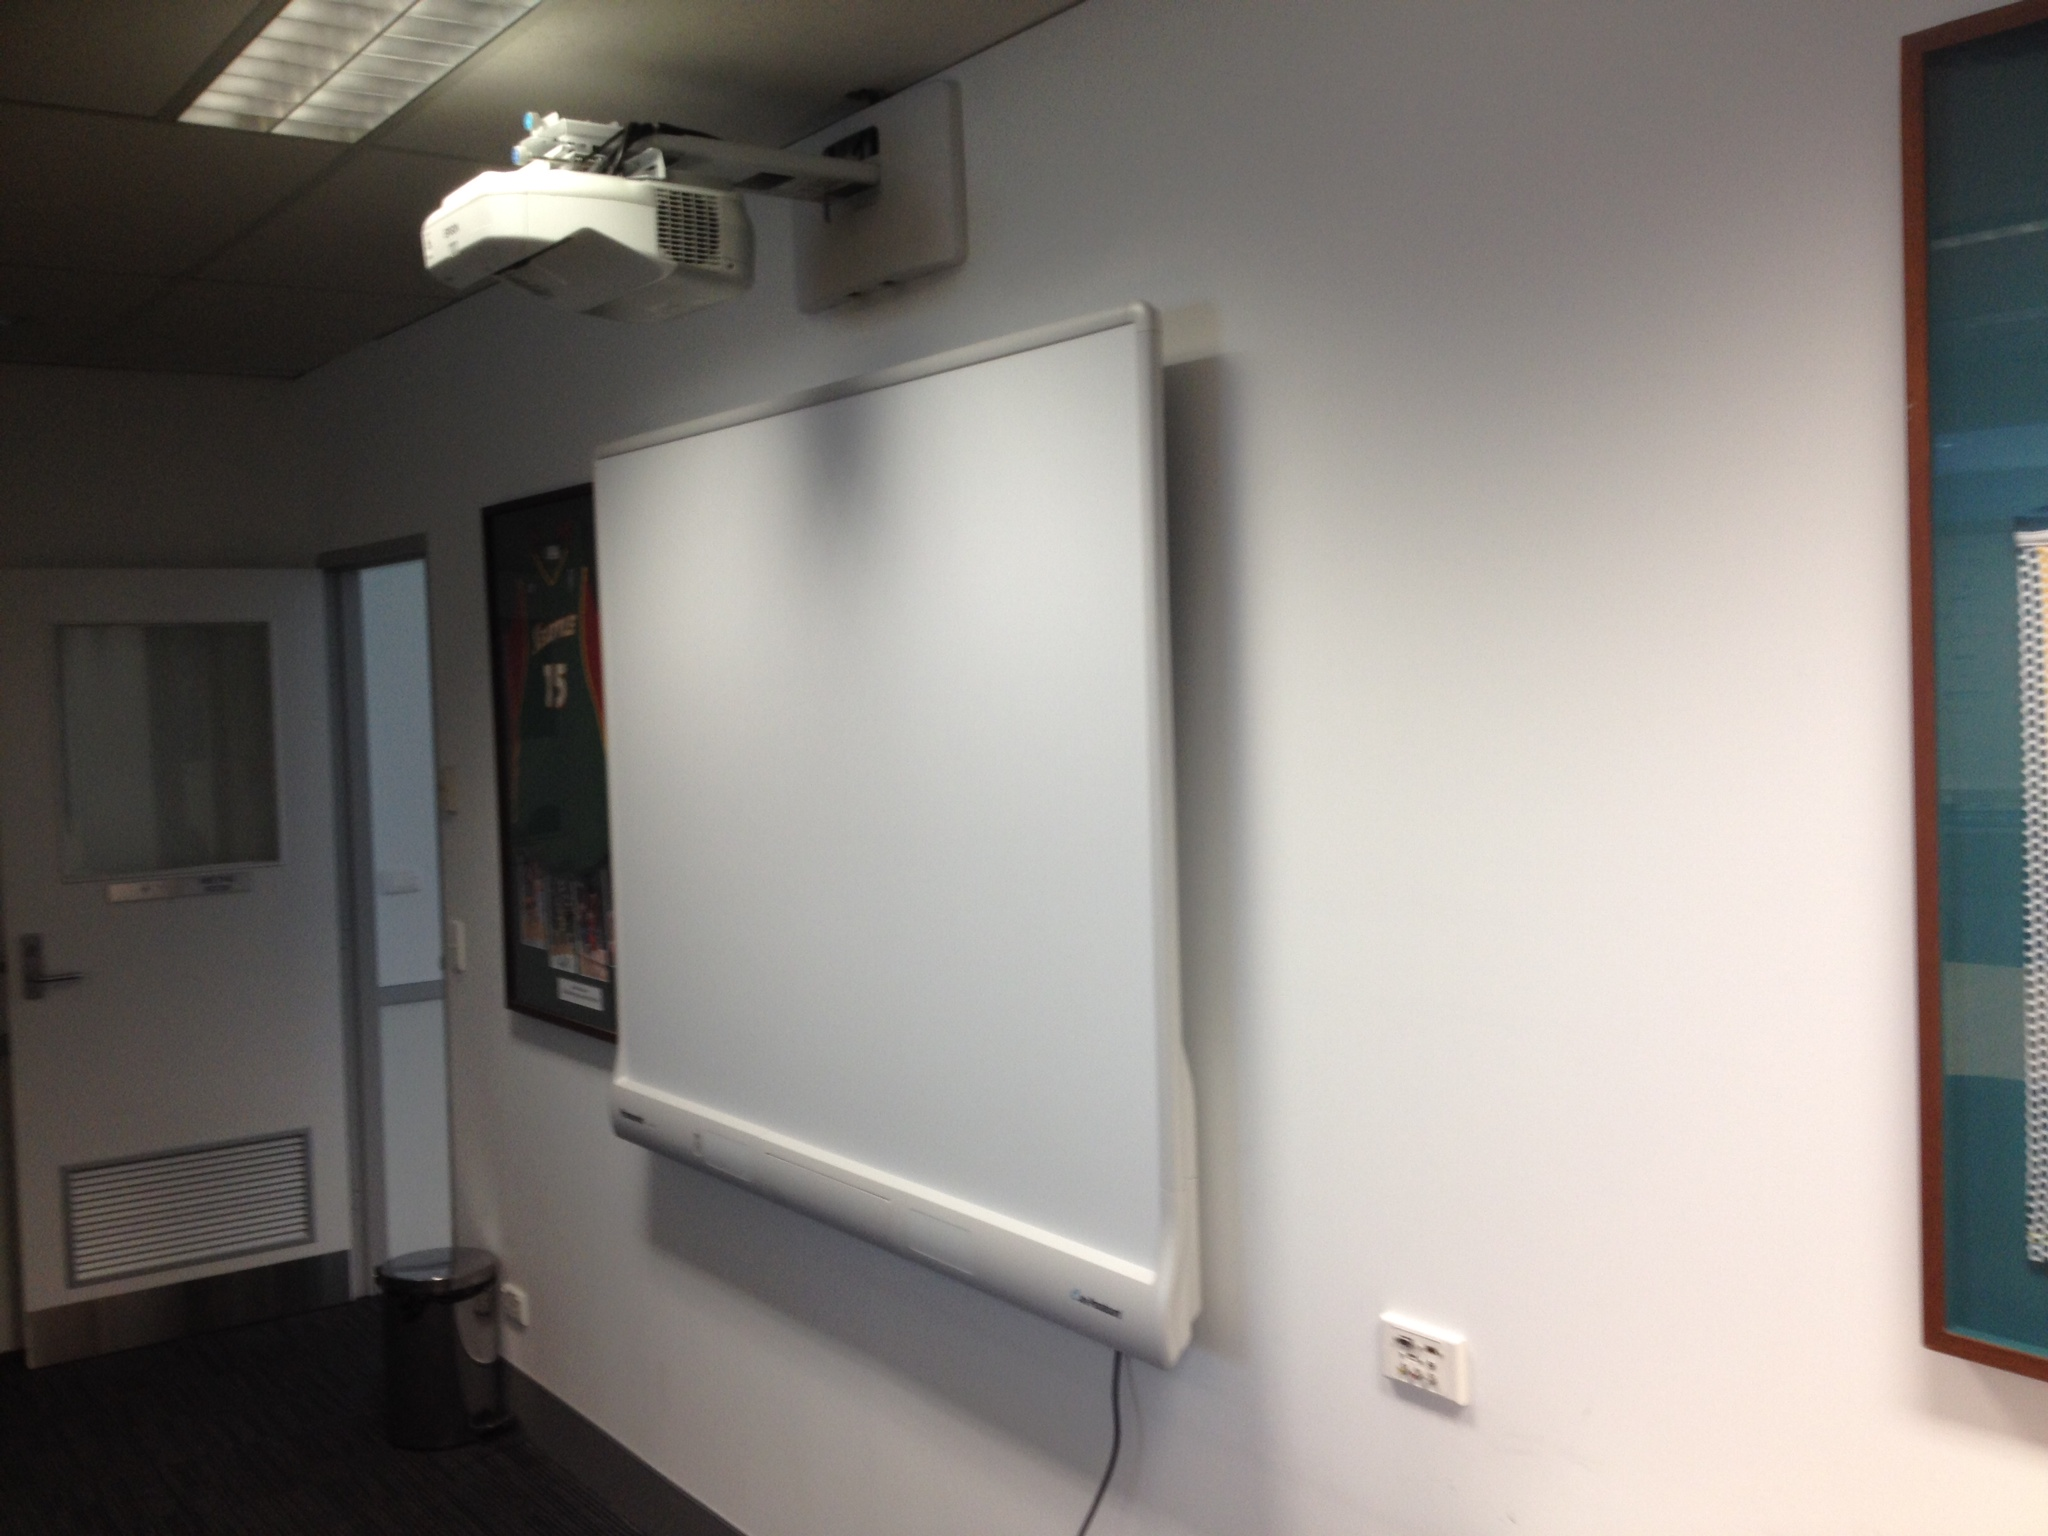 Interactive board installation